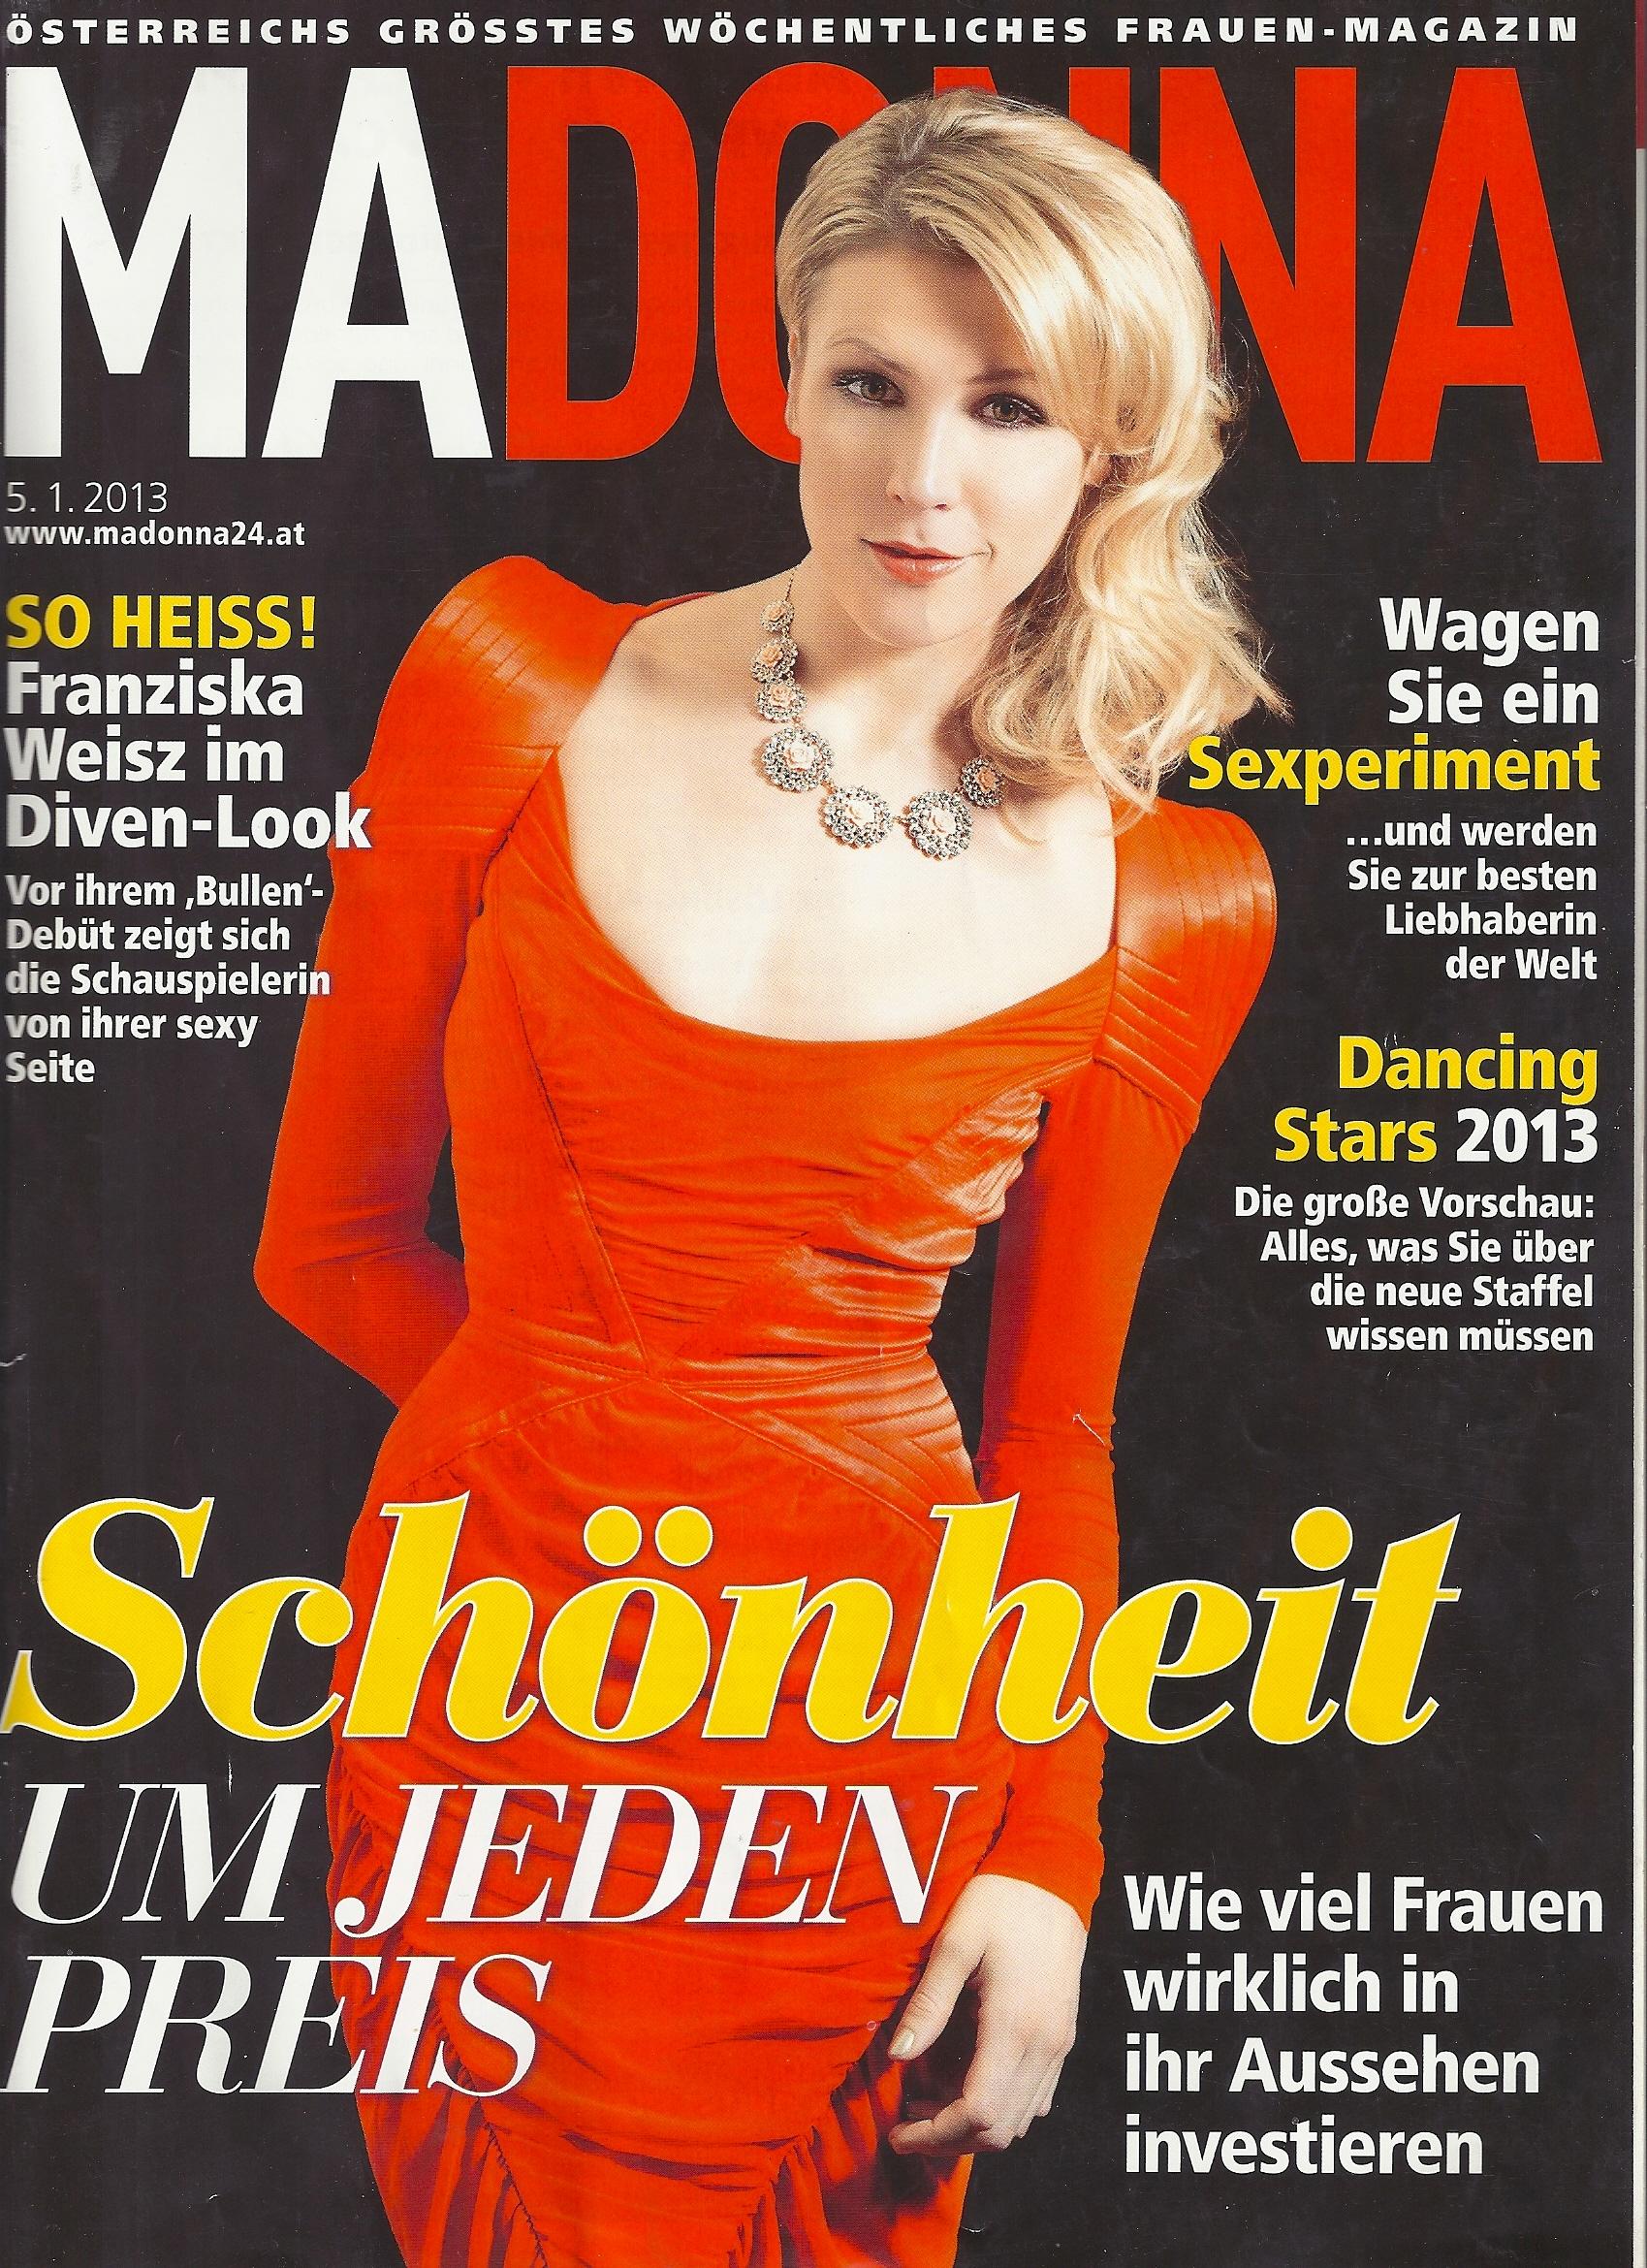 Madonna 5.1.2013